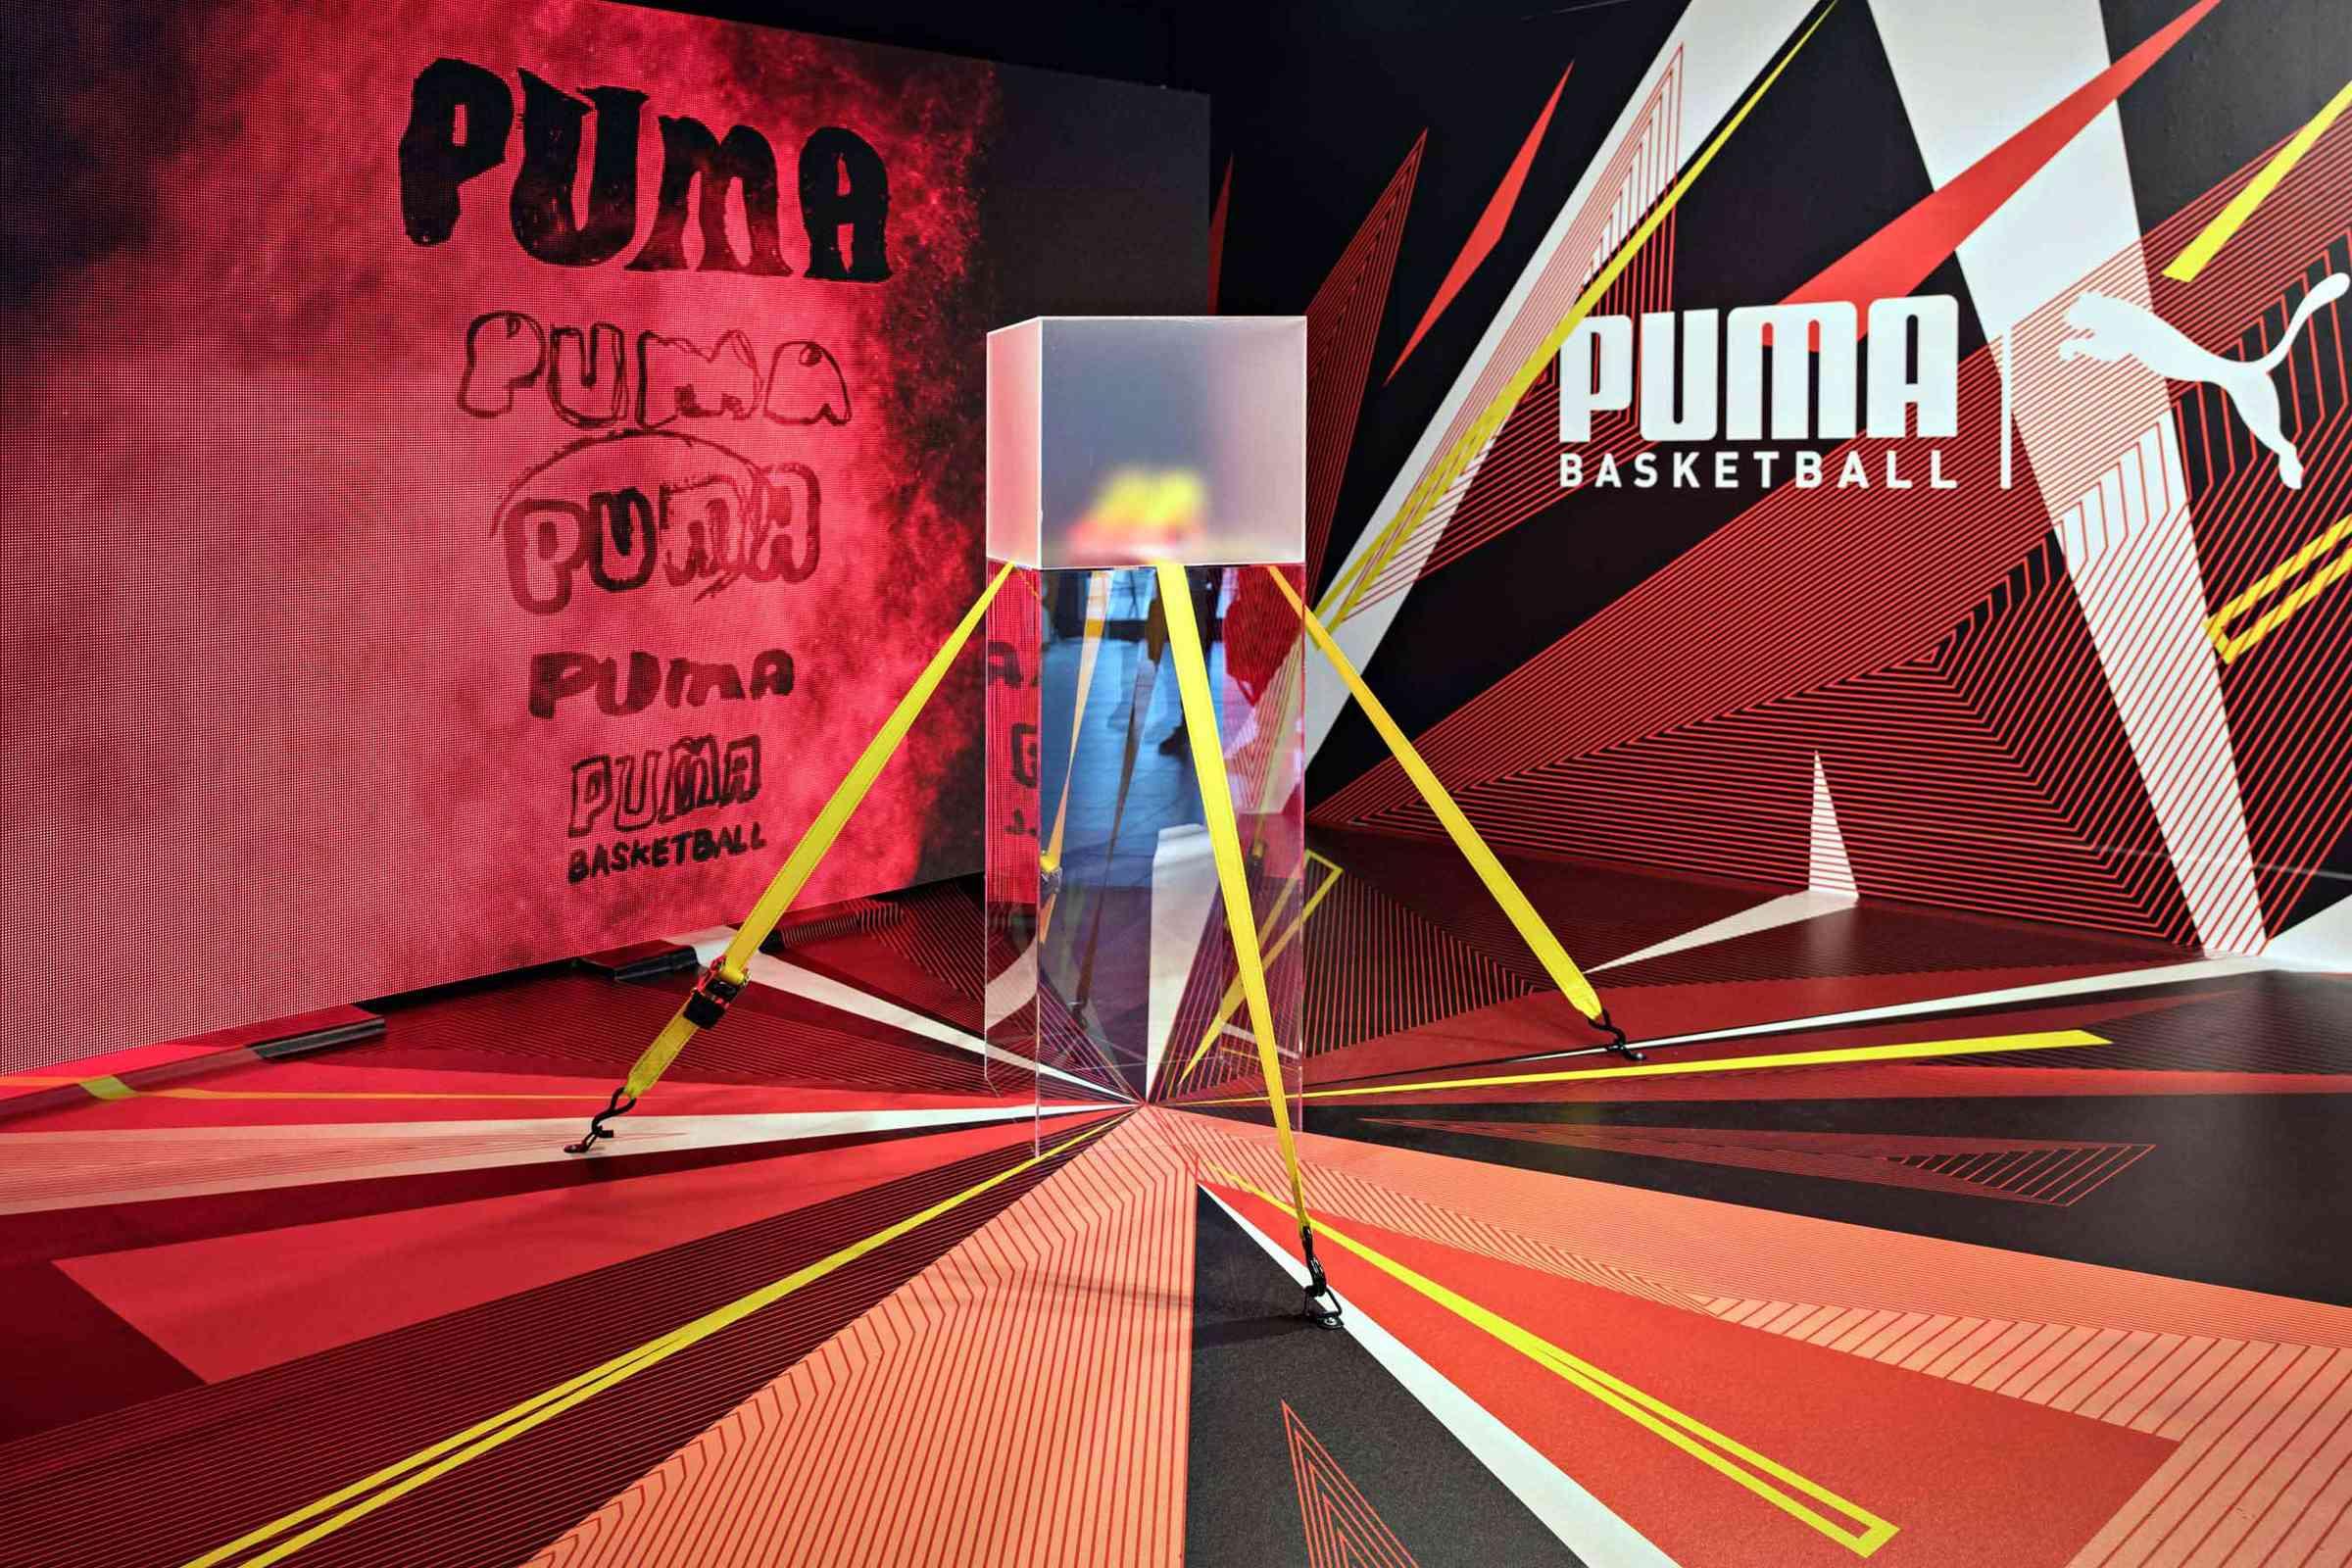 Puma Basketball- Draft Pop up